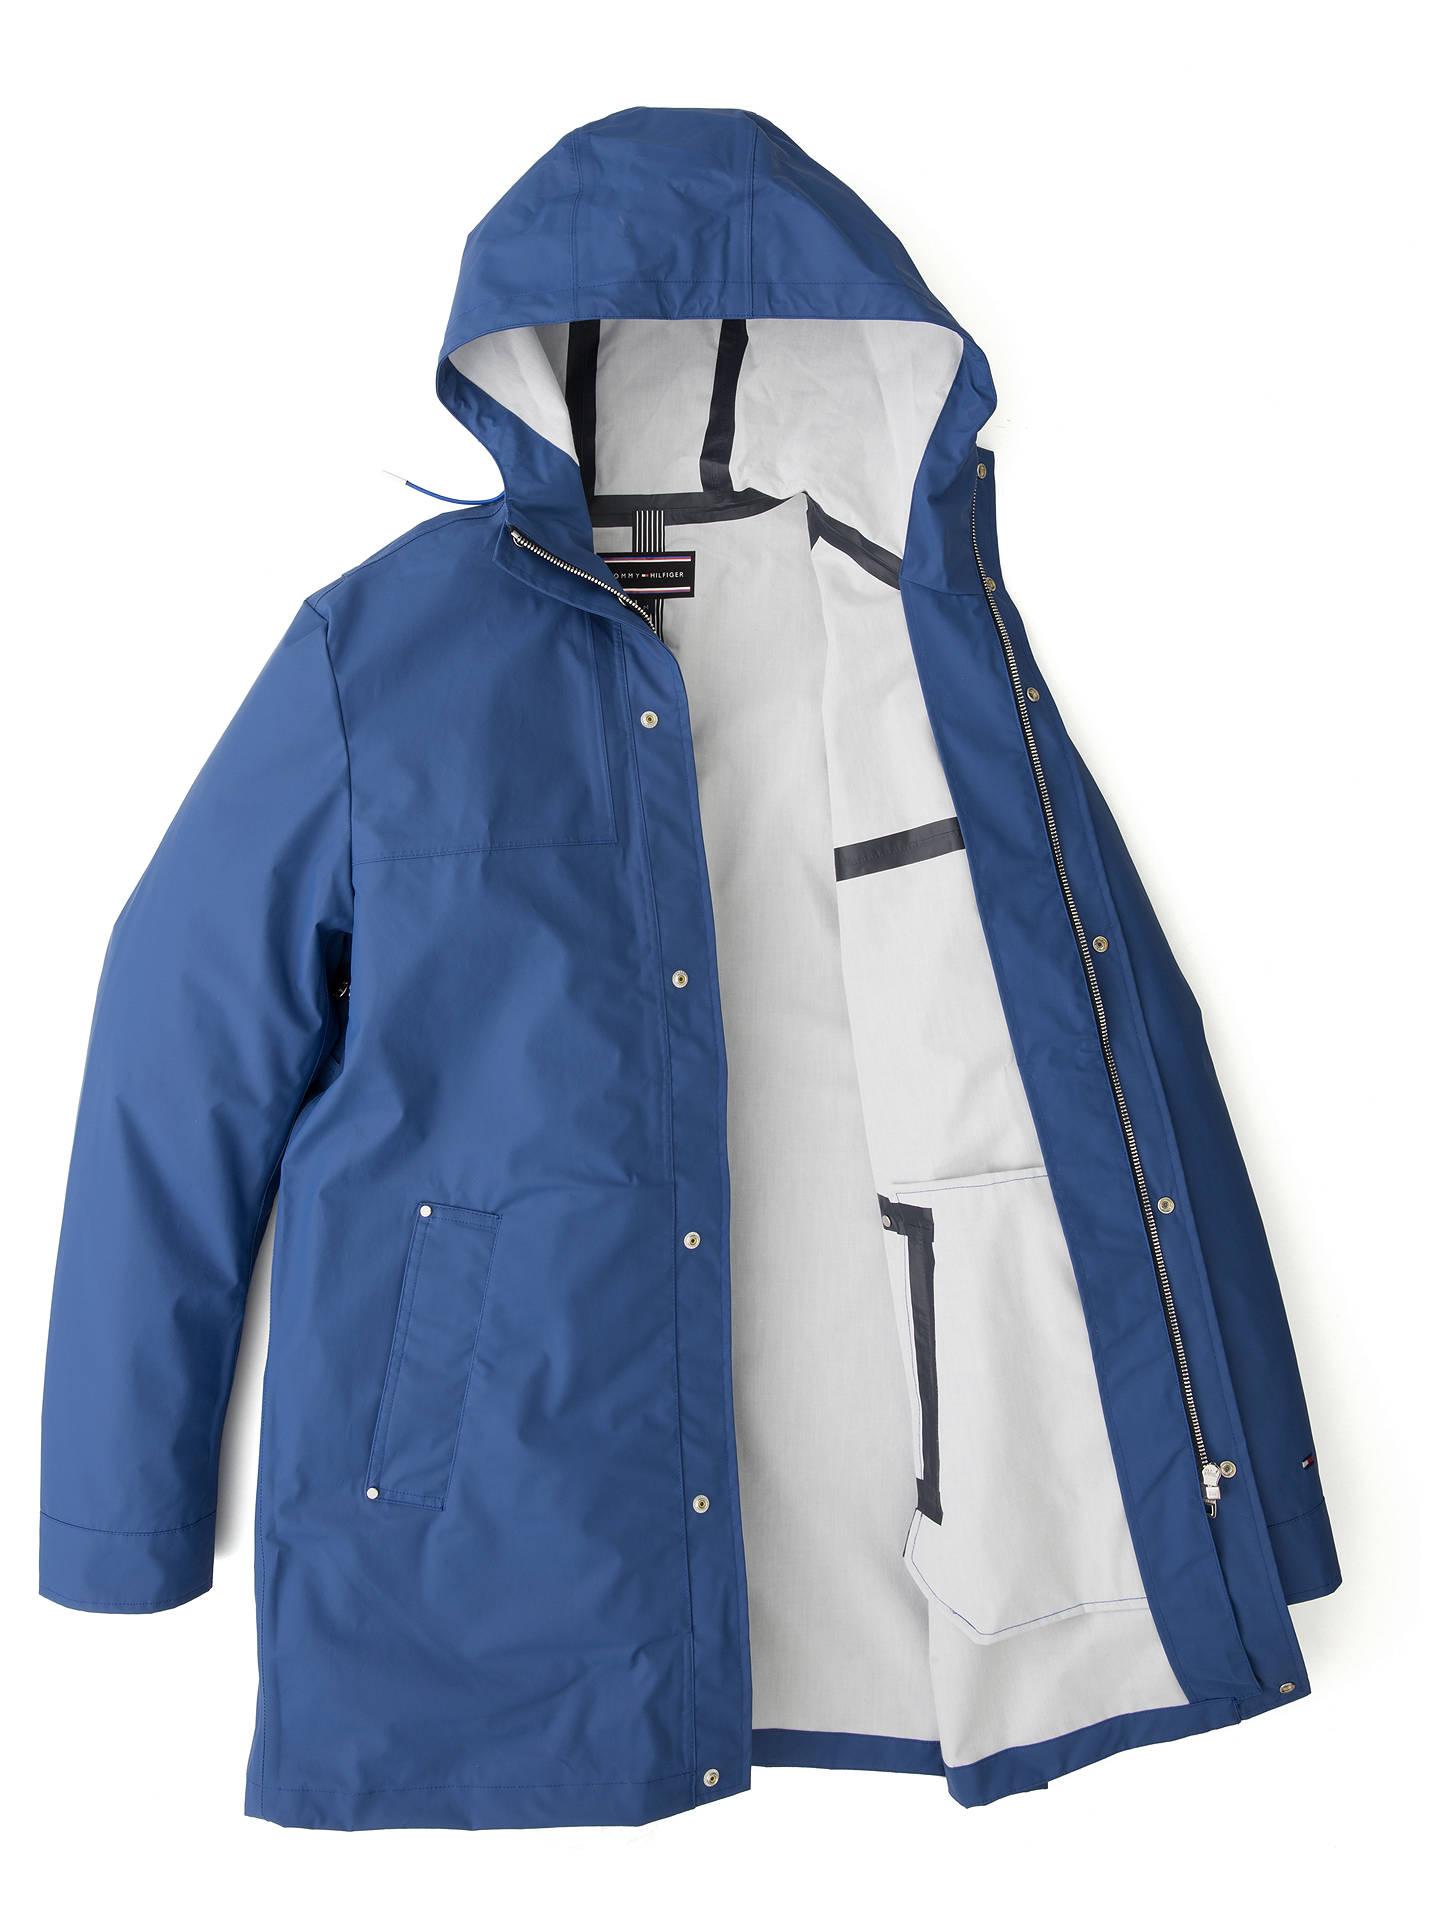 buying new outlet huge selection of Tommy Hilfiger Ranger Raincoat, Surf The Web at John Lewis ...